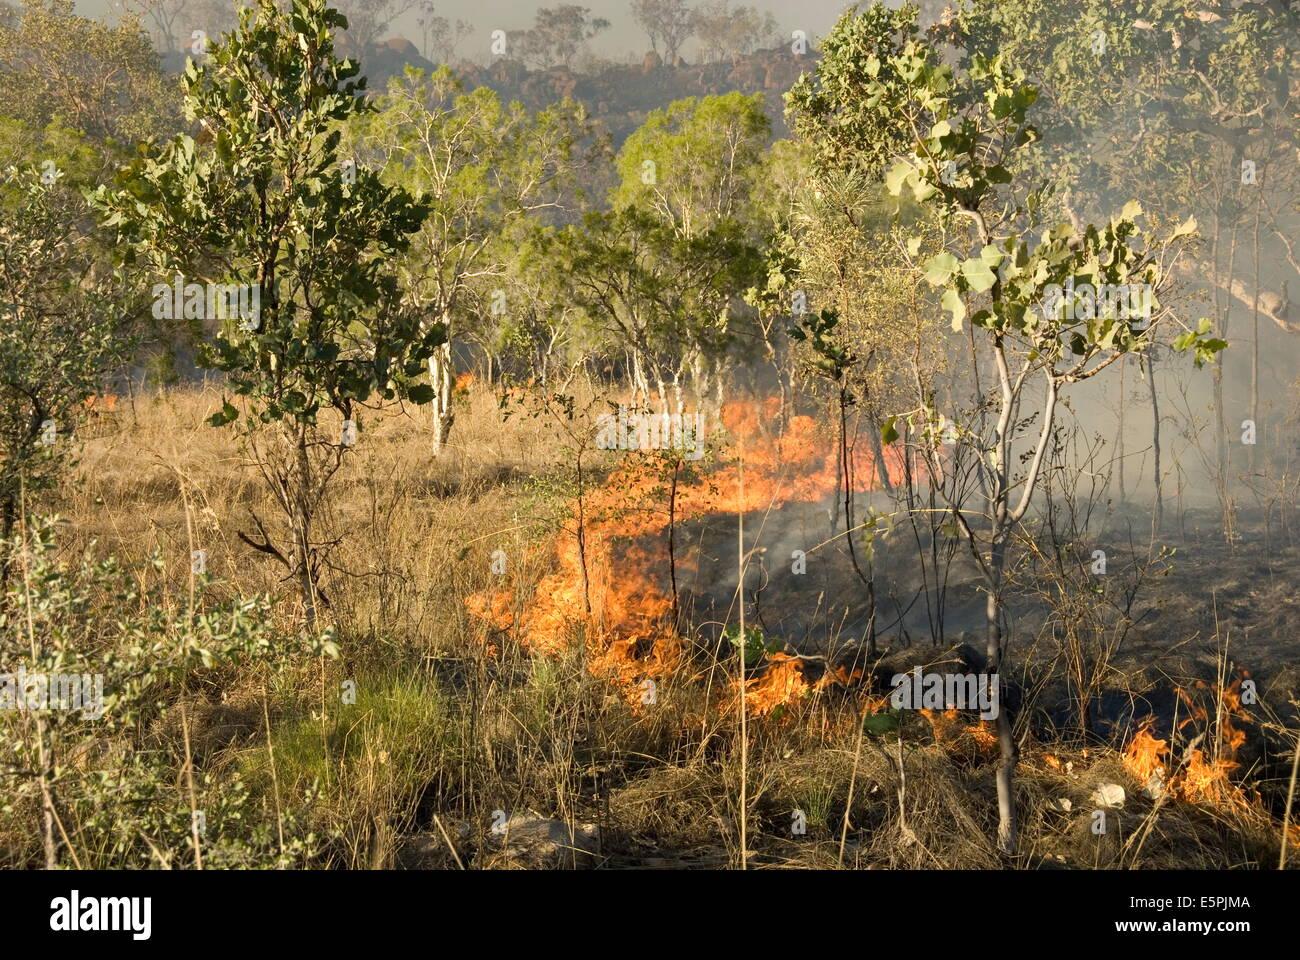 Advancing bush fire beside eastern section of Gibb River Road across The Kimberley, Western Australia, Australia, - Stock Image